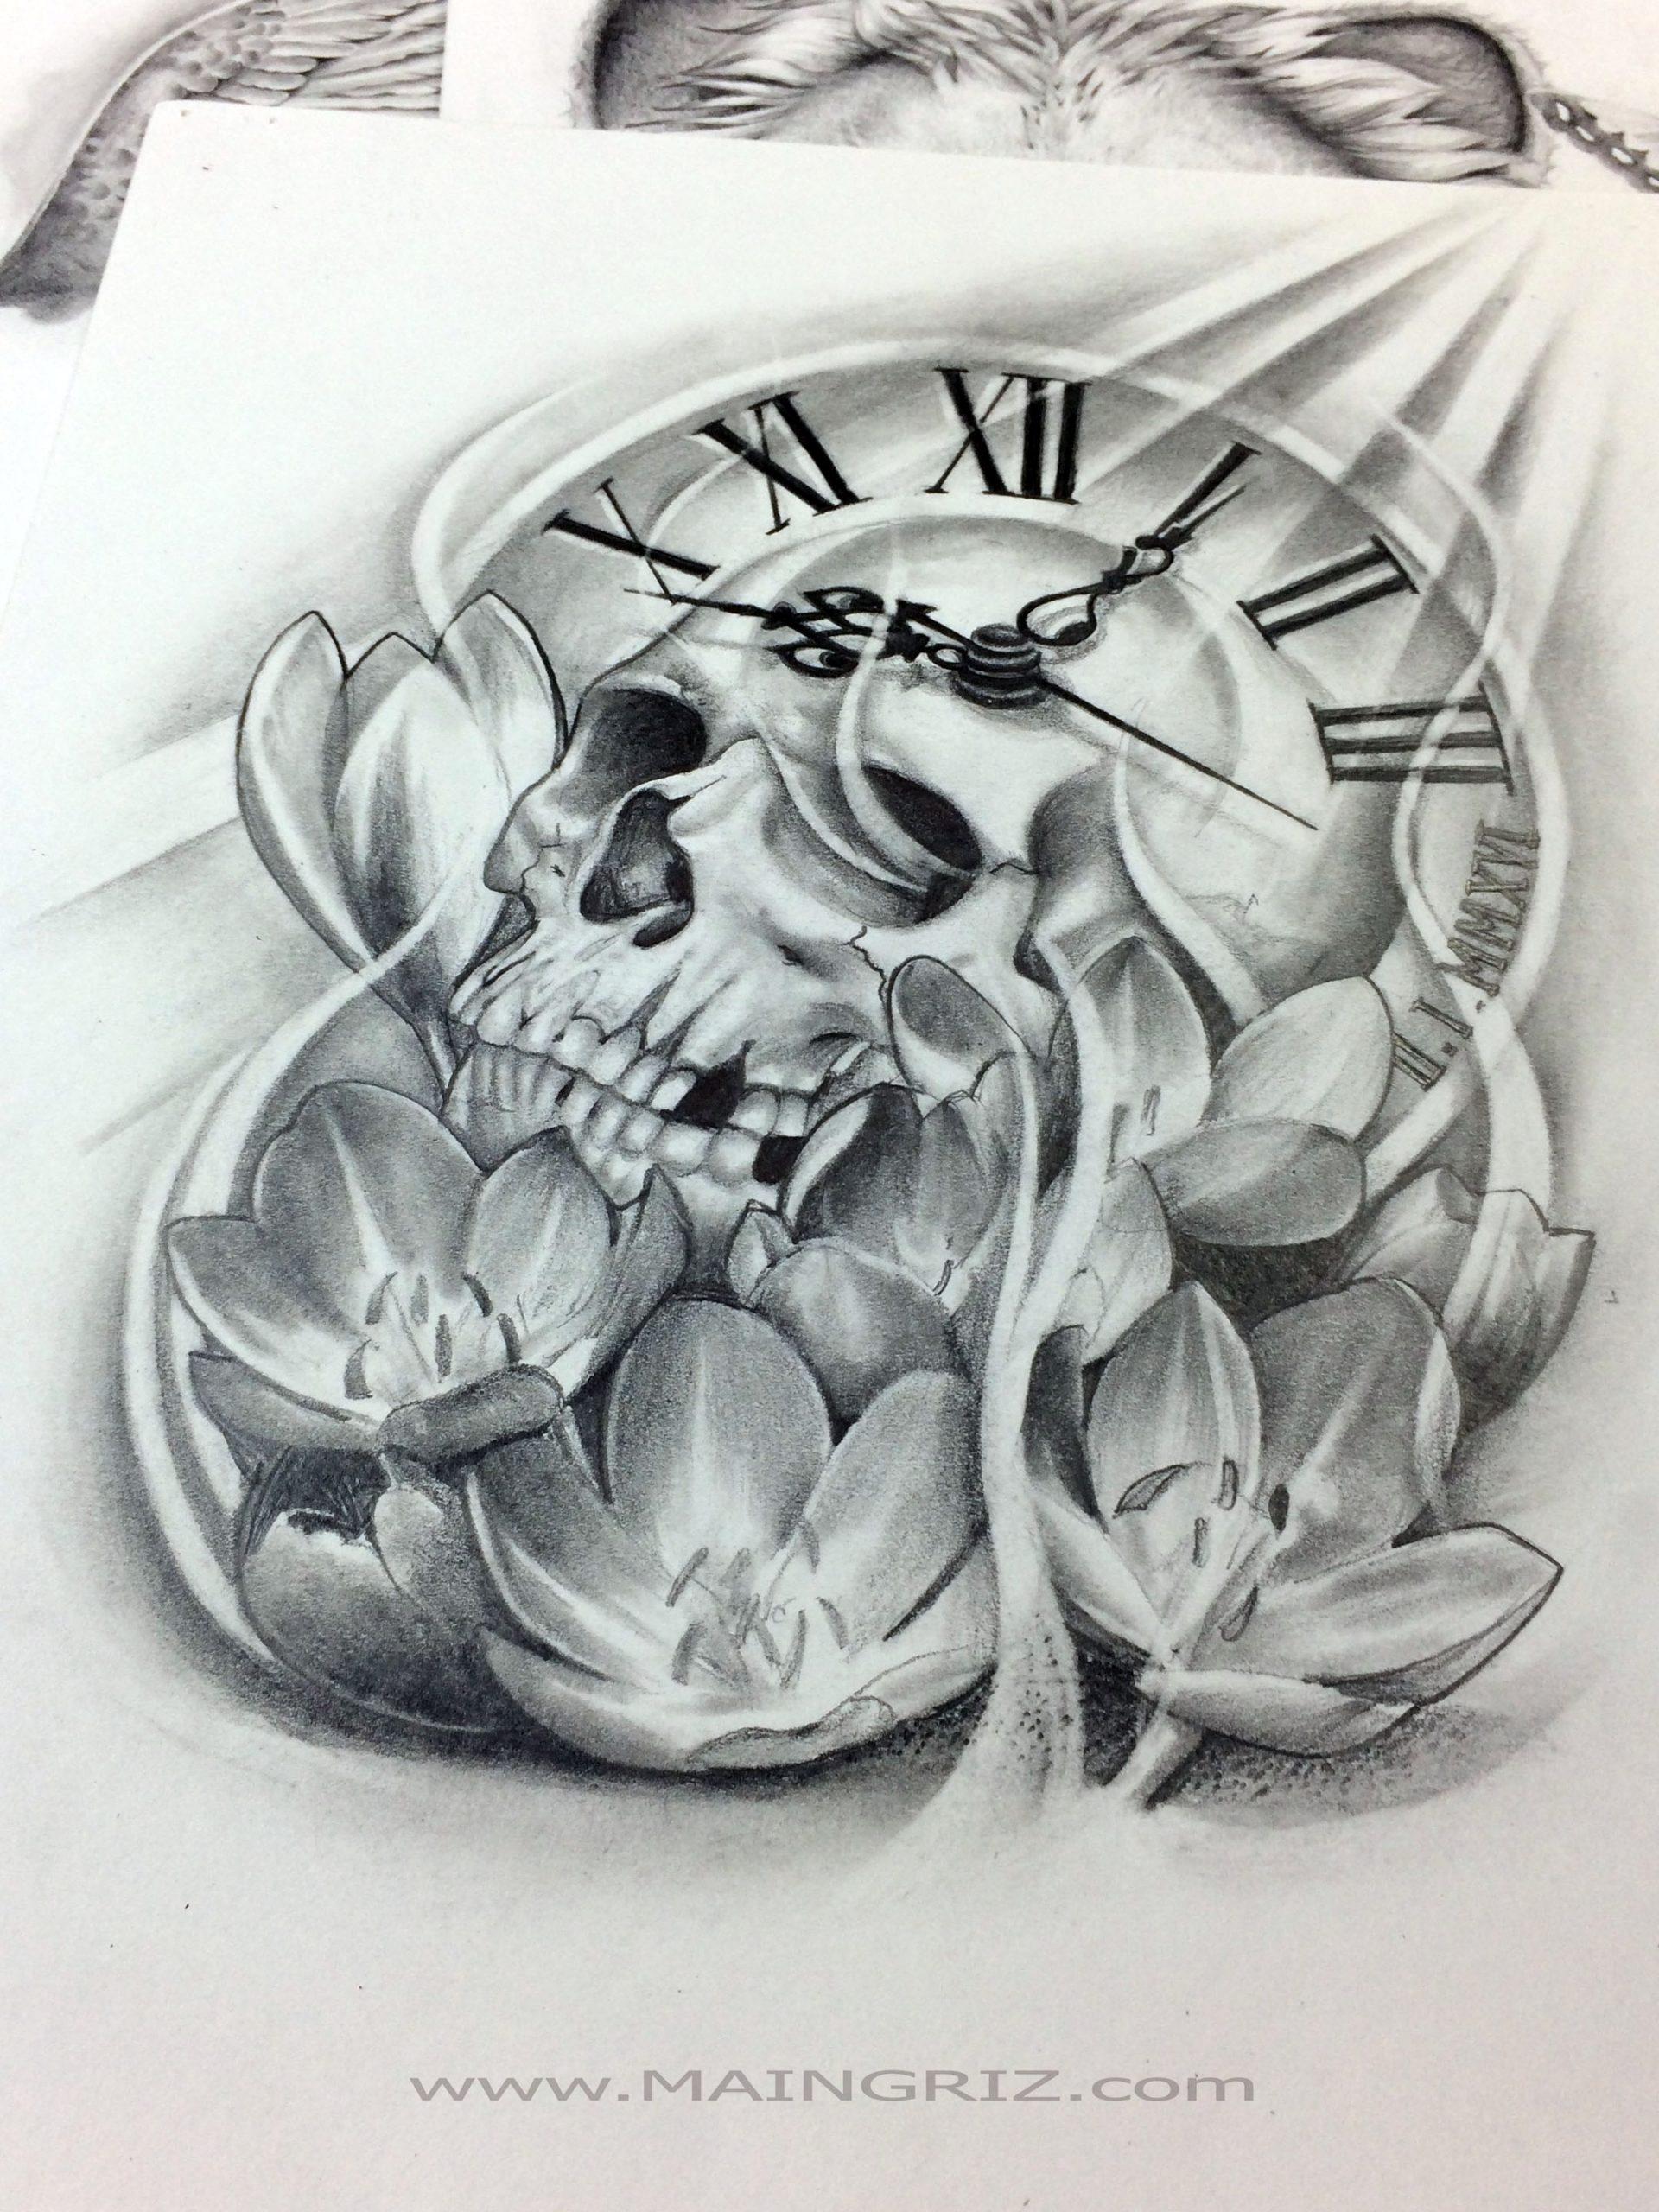 Allan | Maingriz Tattoo Design avec Dessin Chiffre Romain